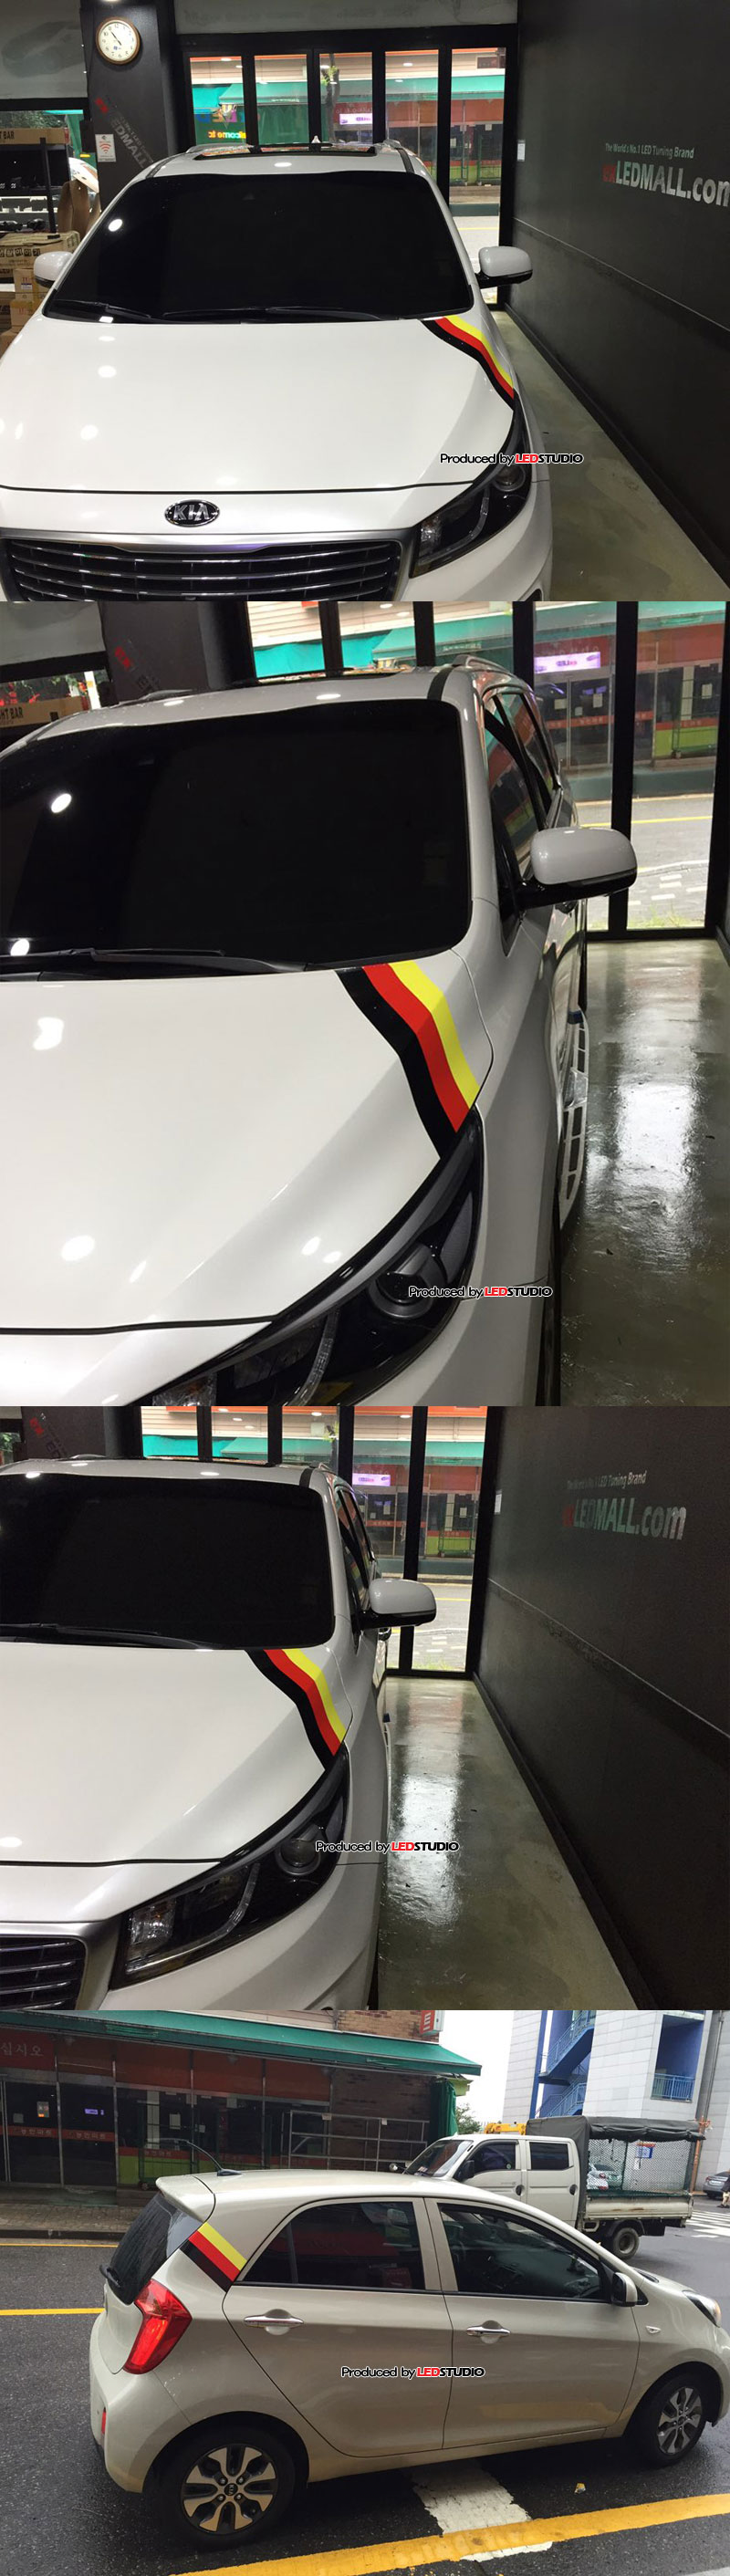 BMW M 스타일 데코레이션 스티커 (폭 15cm / 1m 단위 판매)